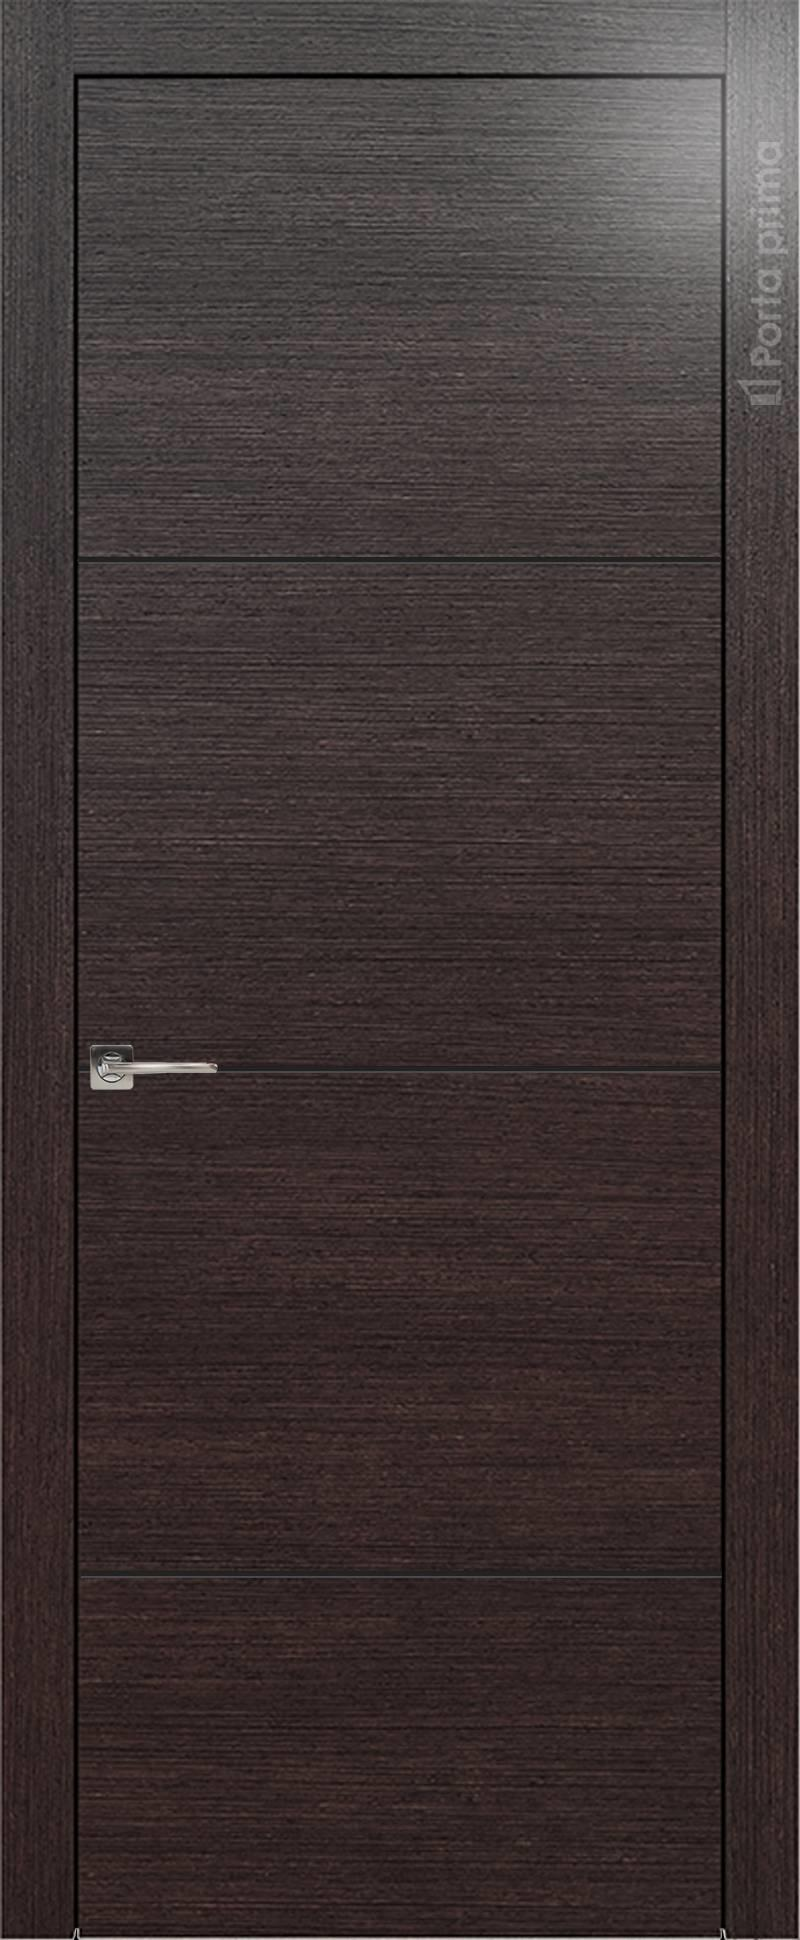 Tivoli Г-2 цвет - Венге Шоколад Без стекла (ДГ)